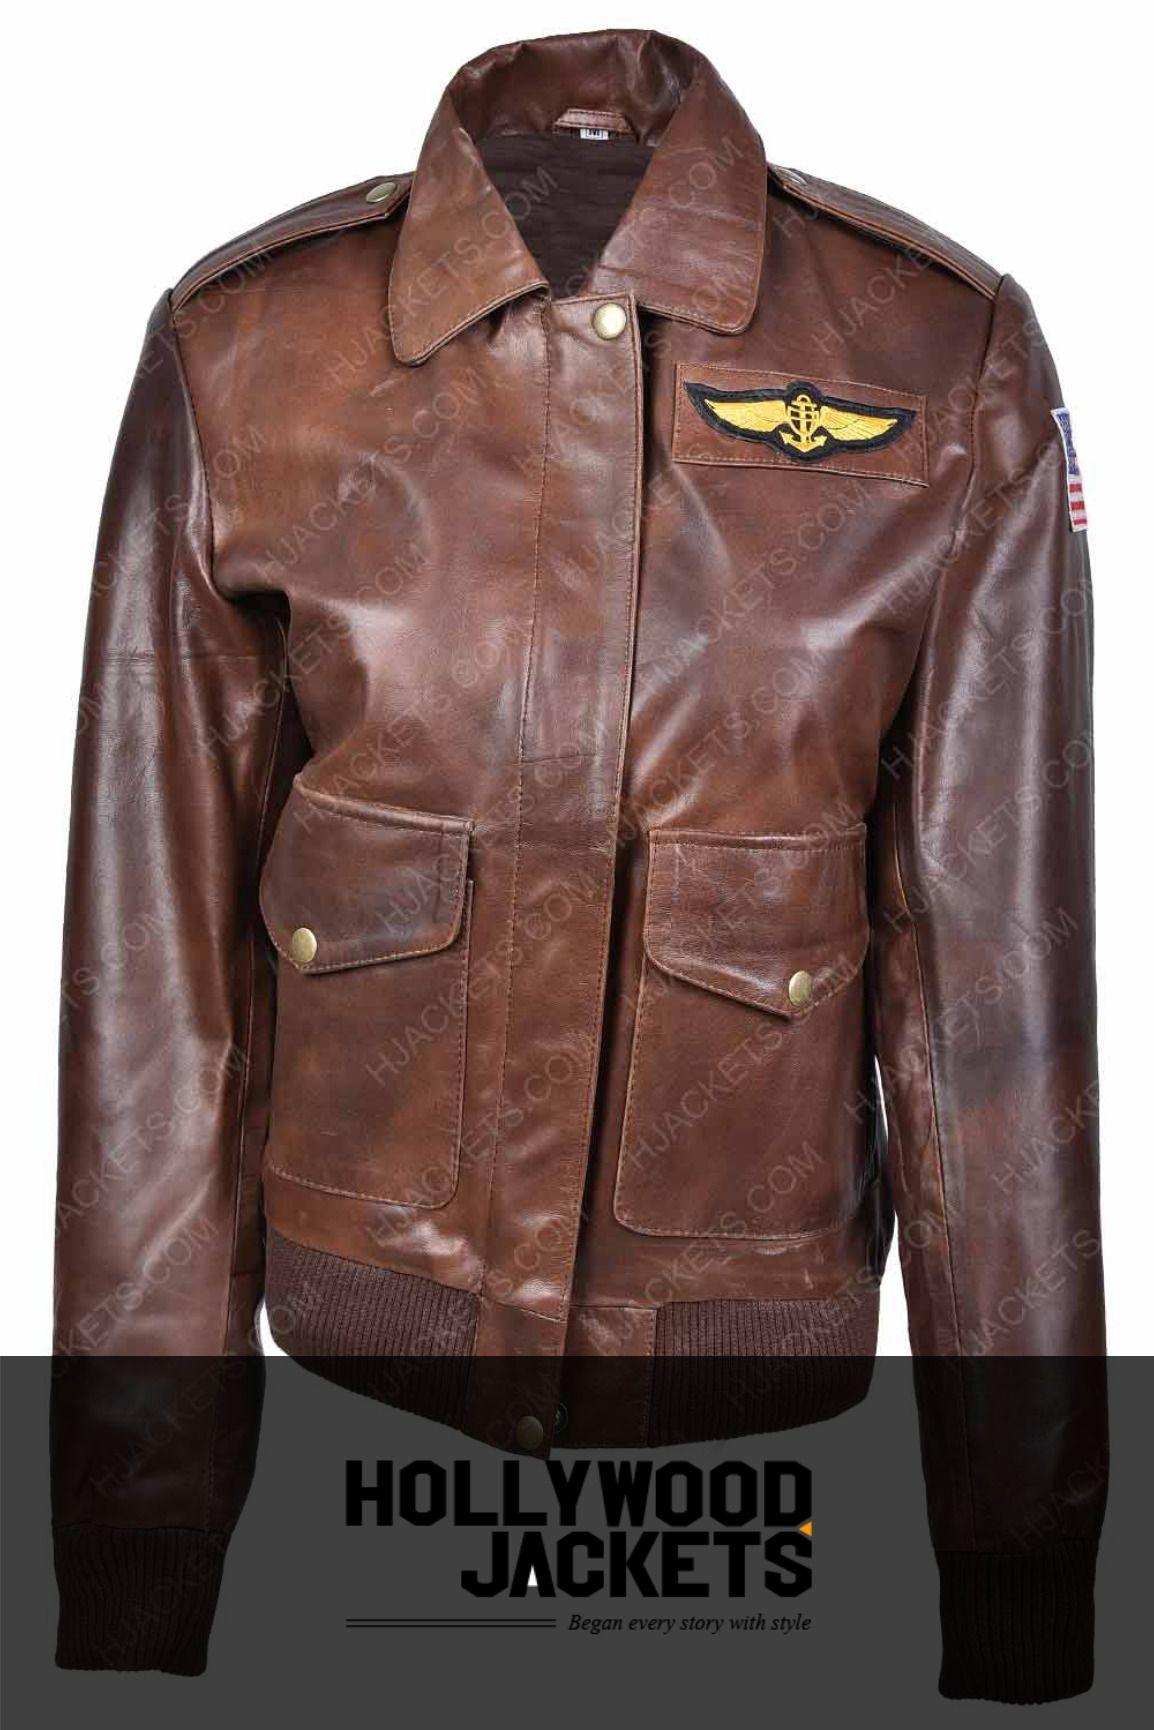 Get Captain Marvel Brie Larson Bomber Jacket On Hjackets Flight Bomber Jacket High Quality Leather Jacket Jackets [ 1730 x 1154 Pixel ]